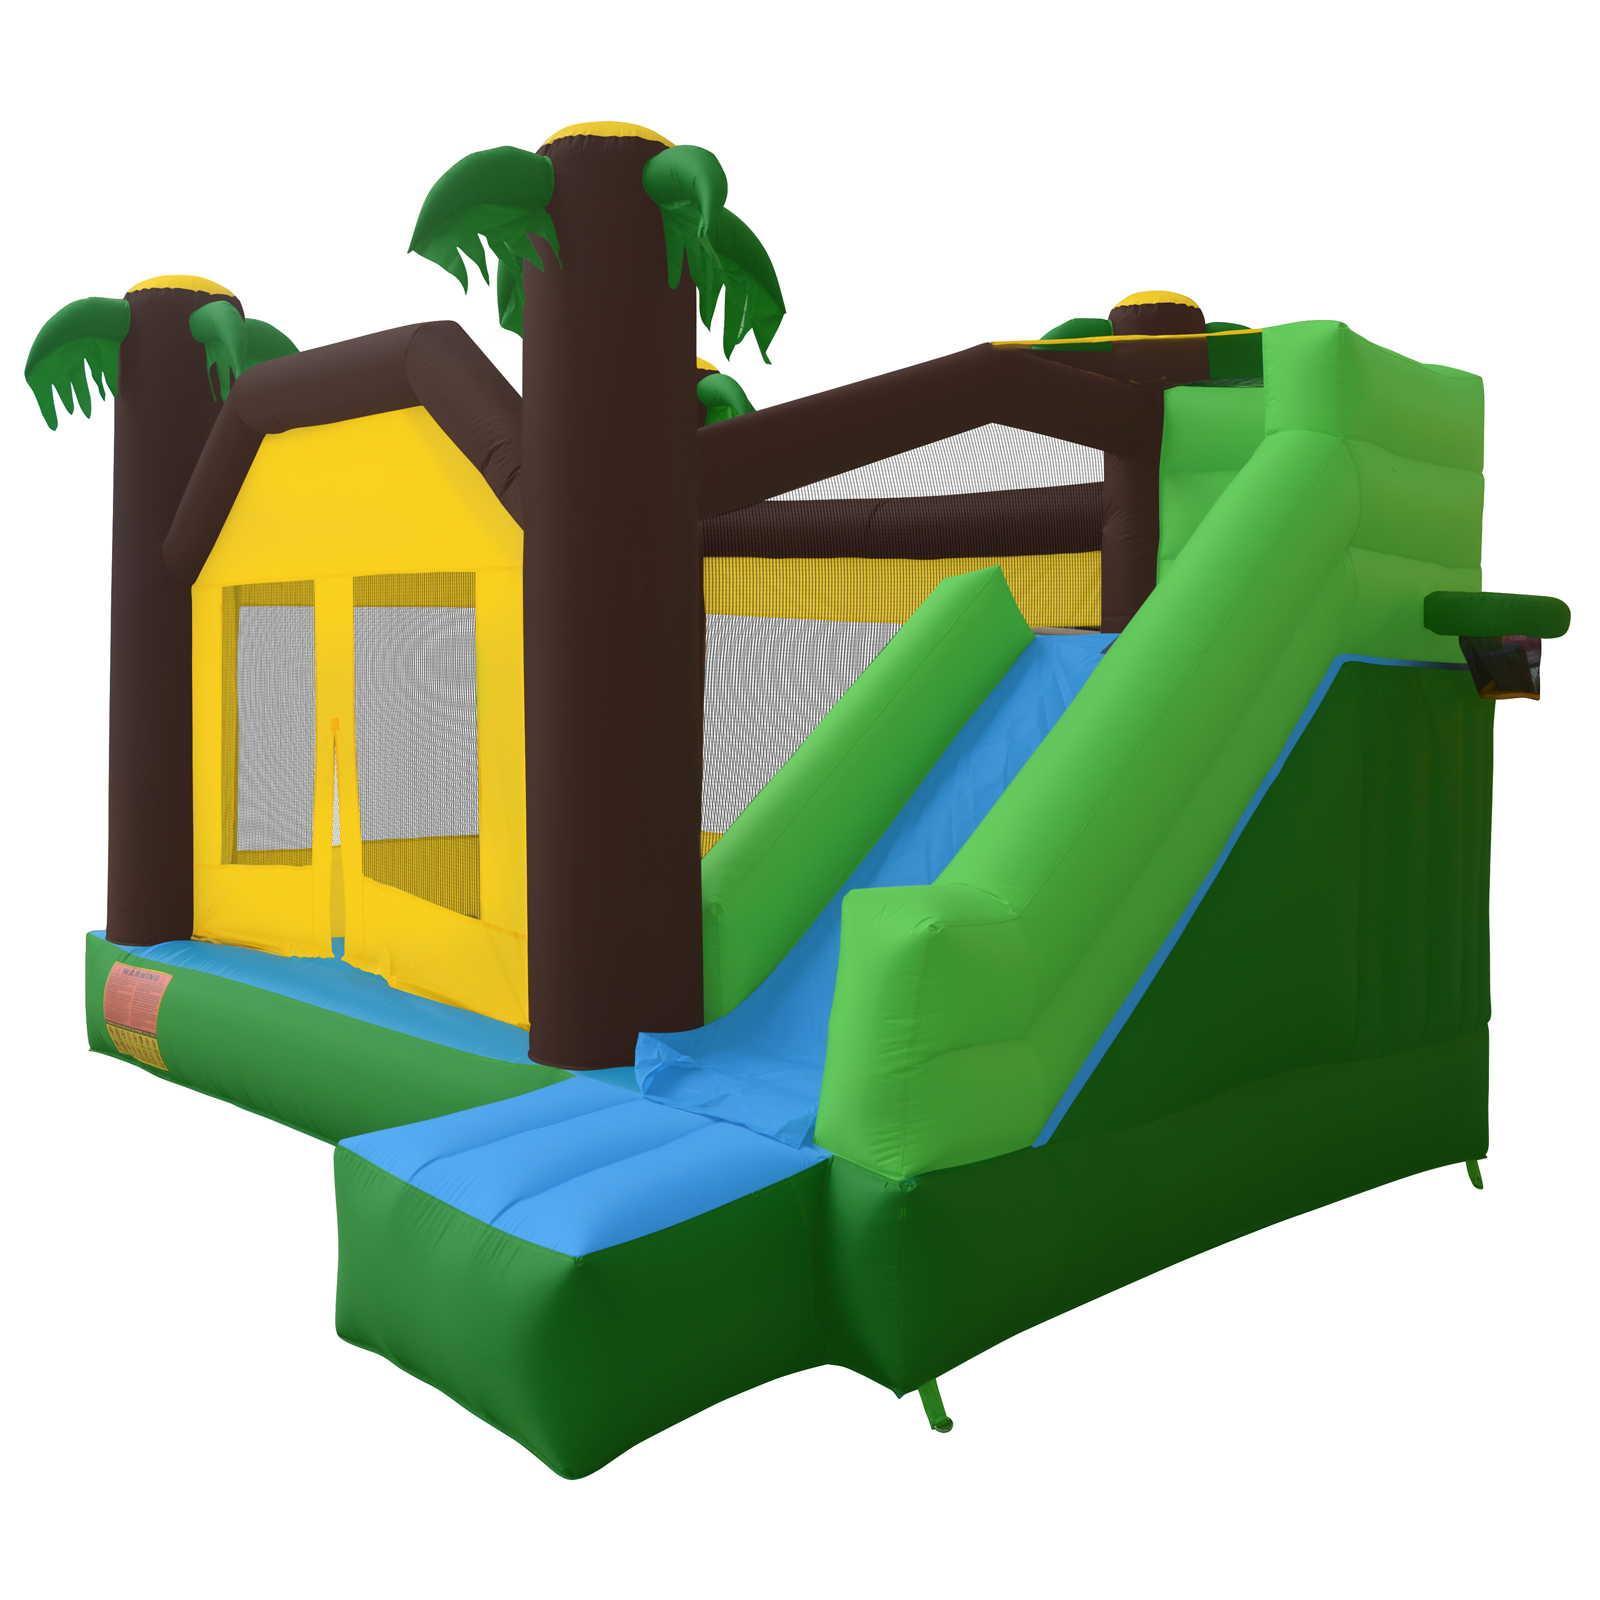 Cloud Nine Jungle Jumper Bounce House - Inflatable Bounci...